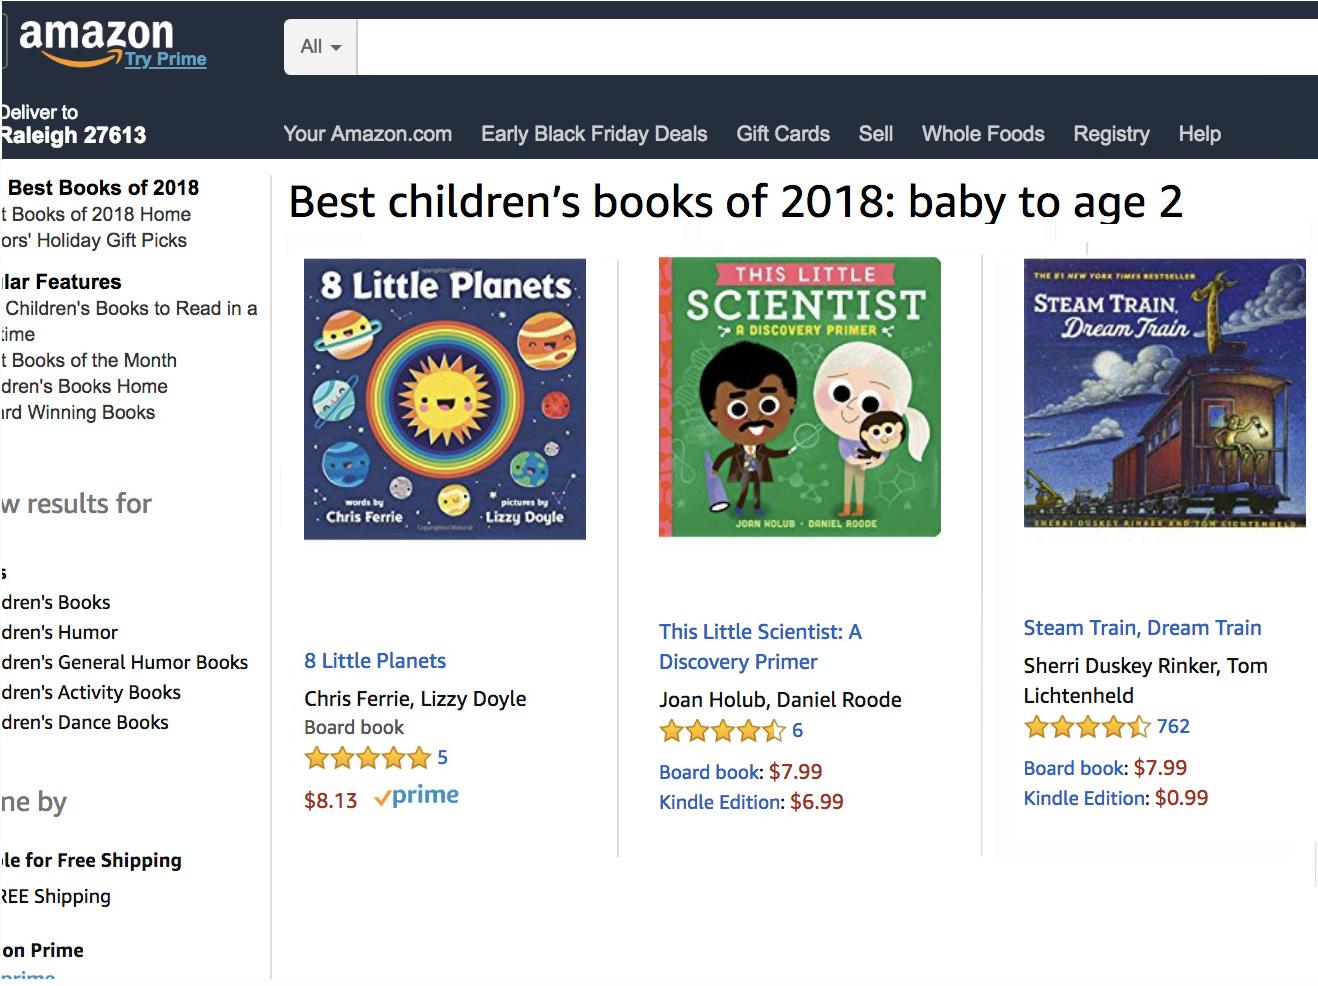 Amazon Best Children's Books of 2018 Holub Roode This Little Scientist.jpg